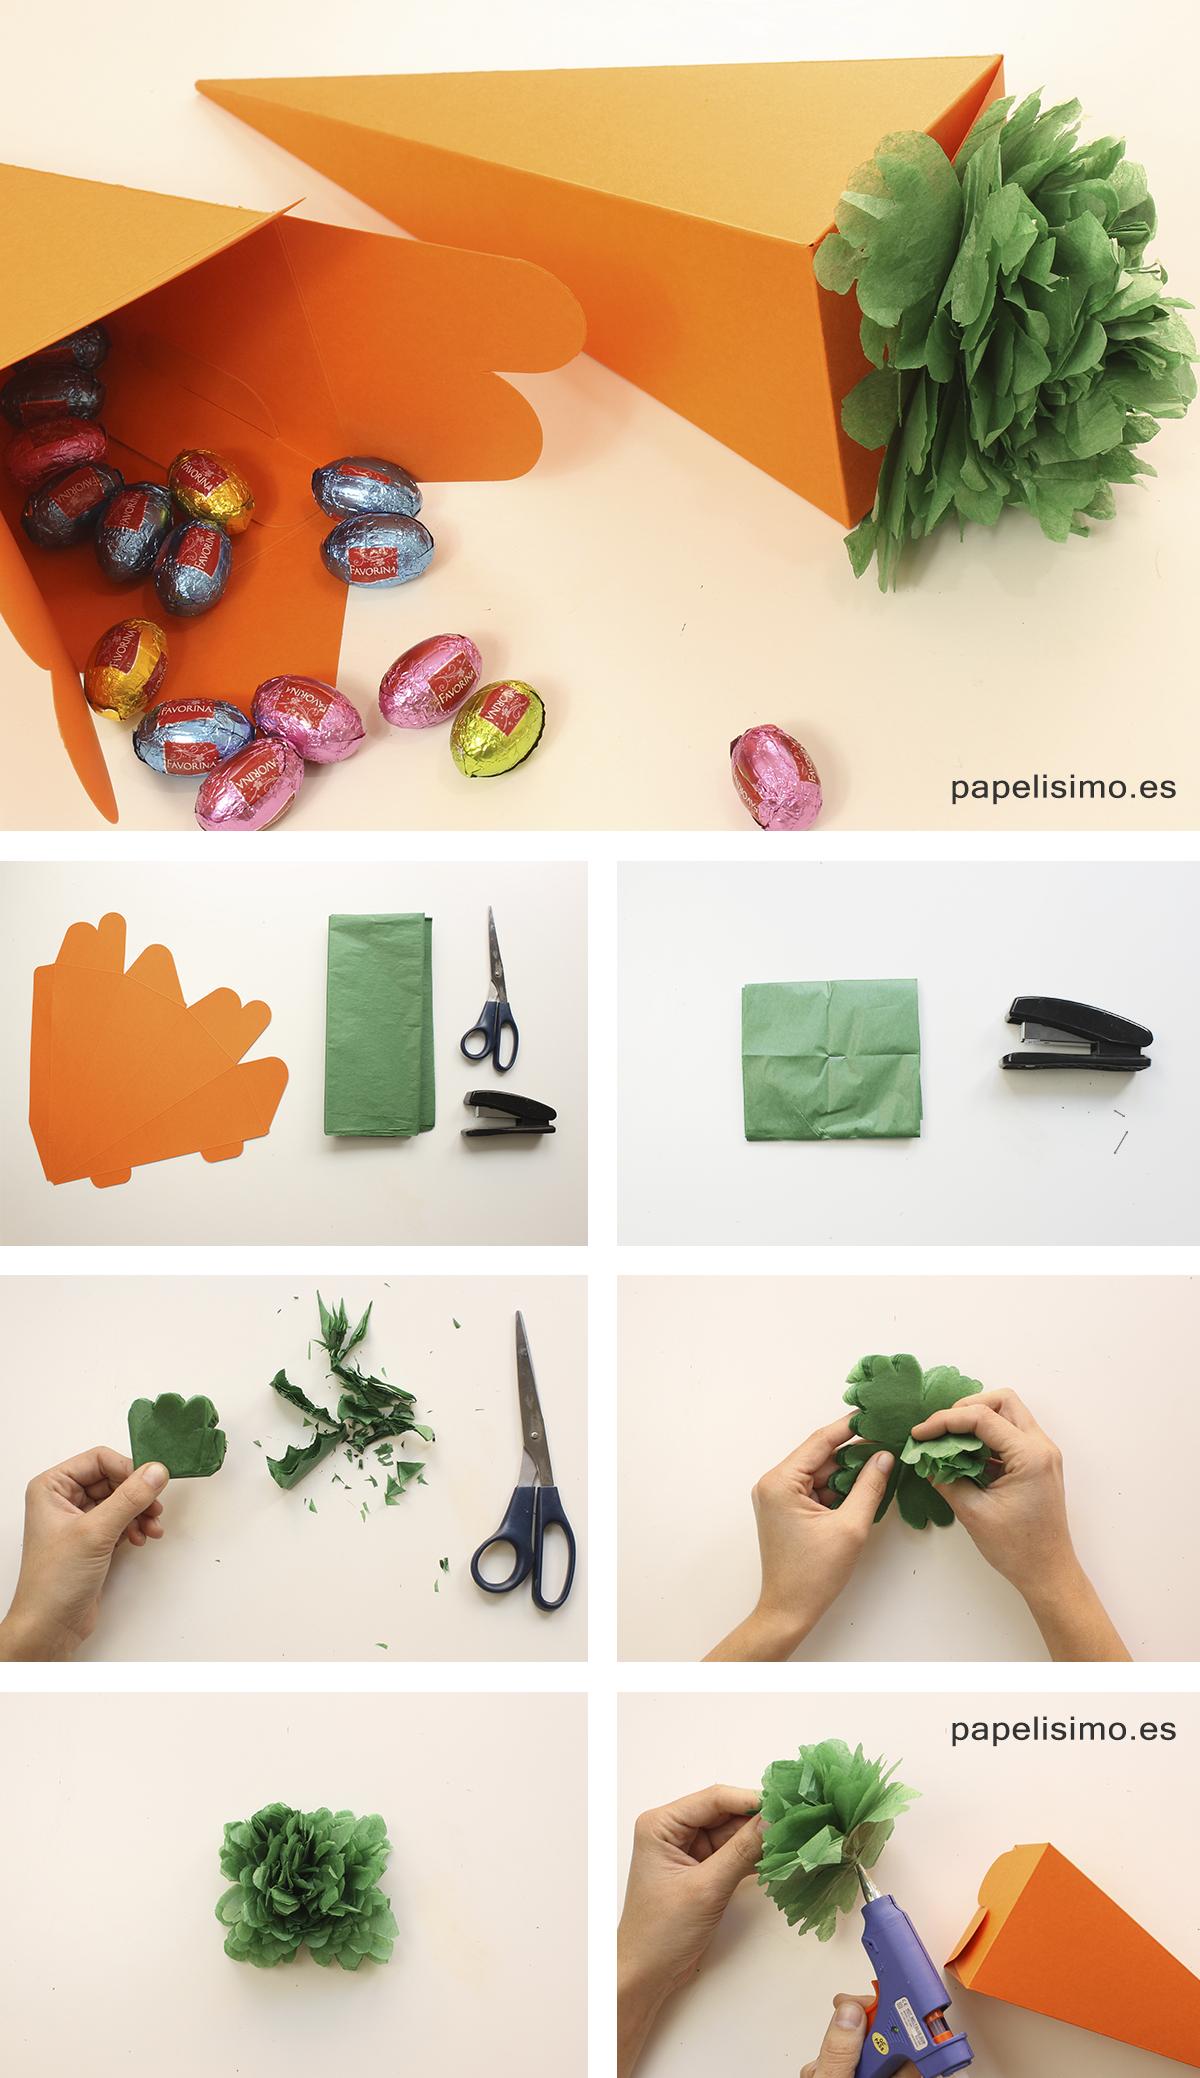 Zanahoria de papel de seda crepe Pascua DIY Paper carrots Easter